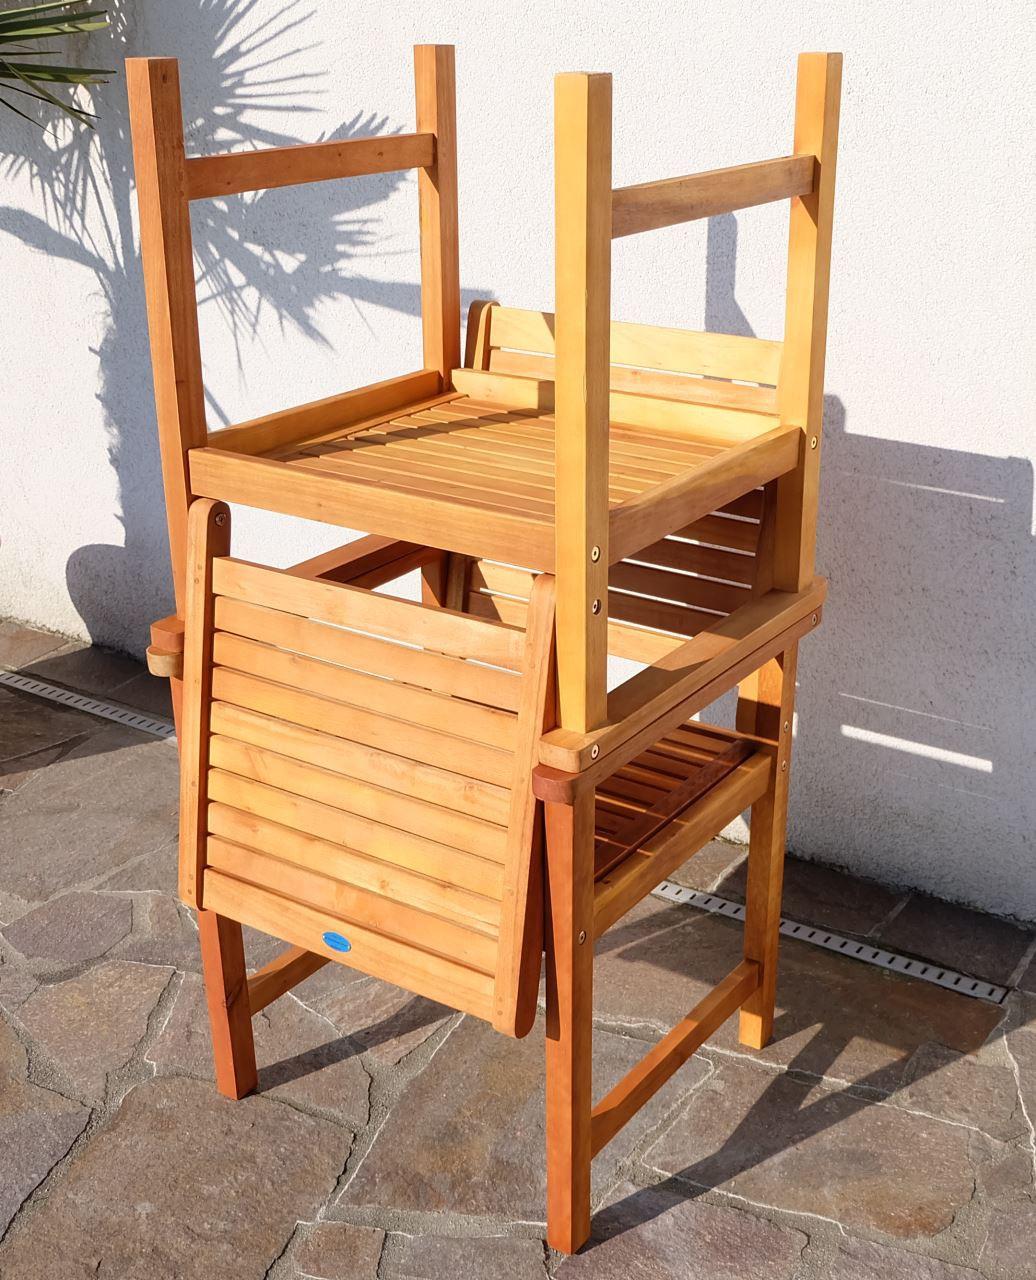 design gartenstuhl saria eu aus eukalyptus wie teak. Black Bedroom Furniture Sets. Home Design Ideas